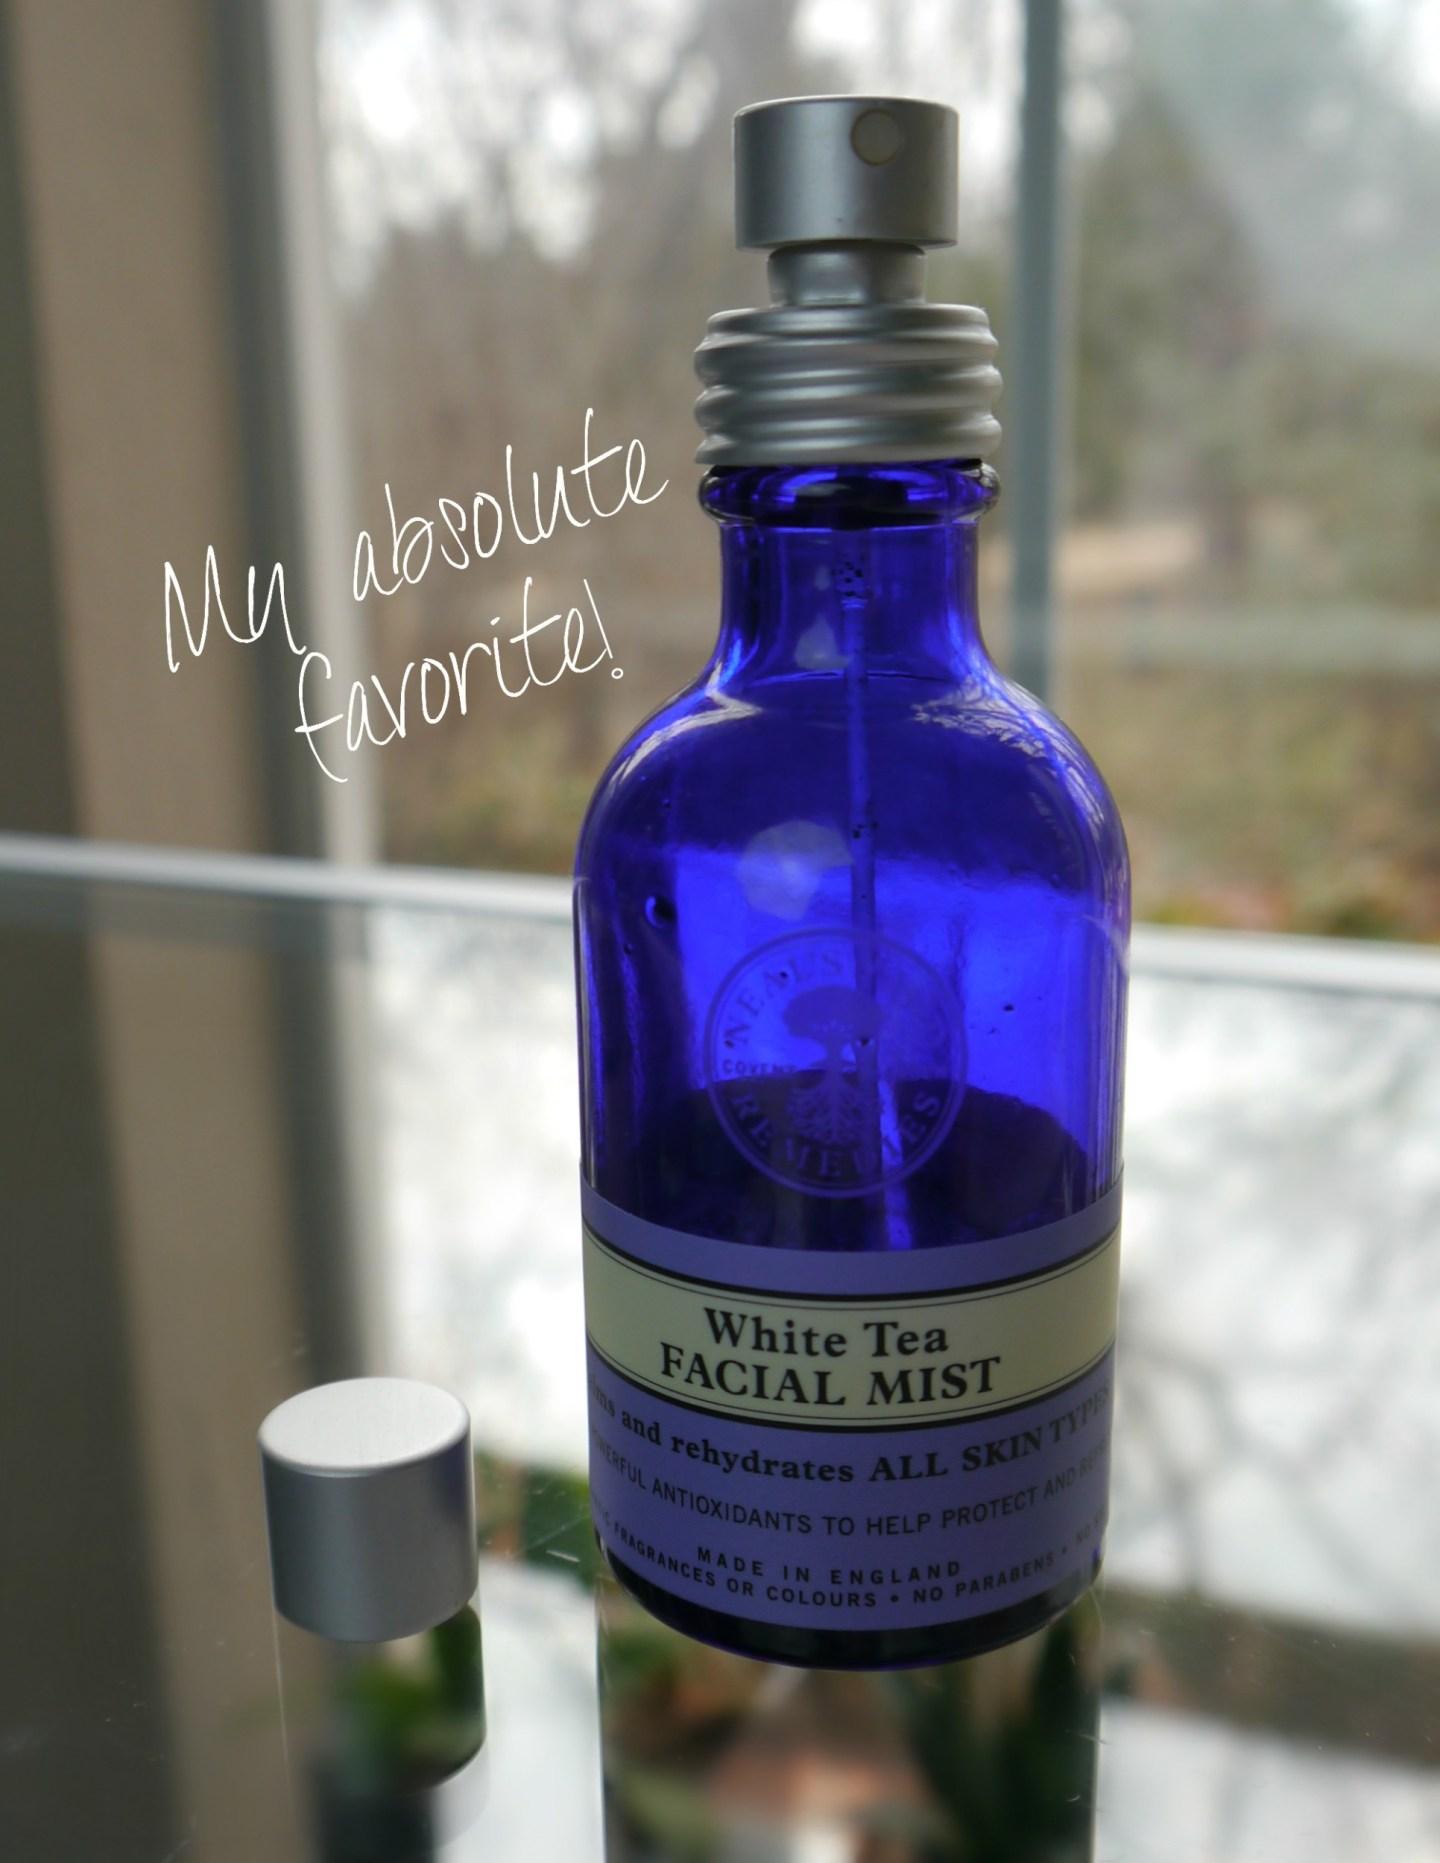 White Tea Facial Mist